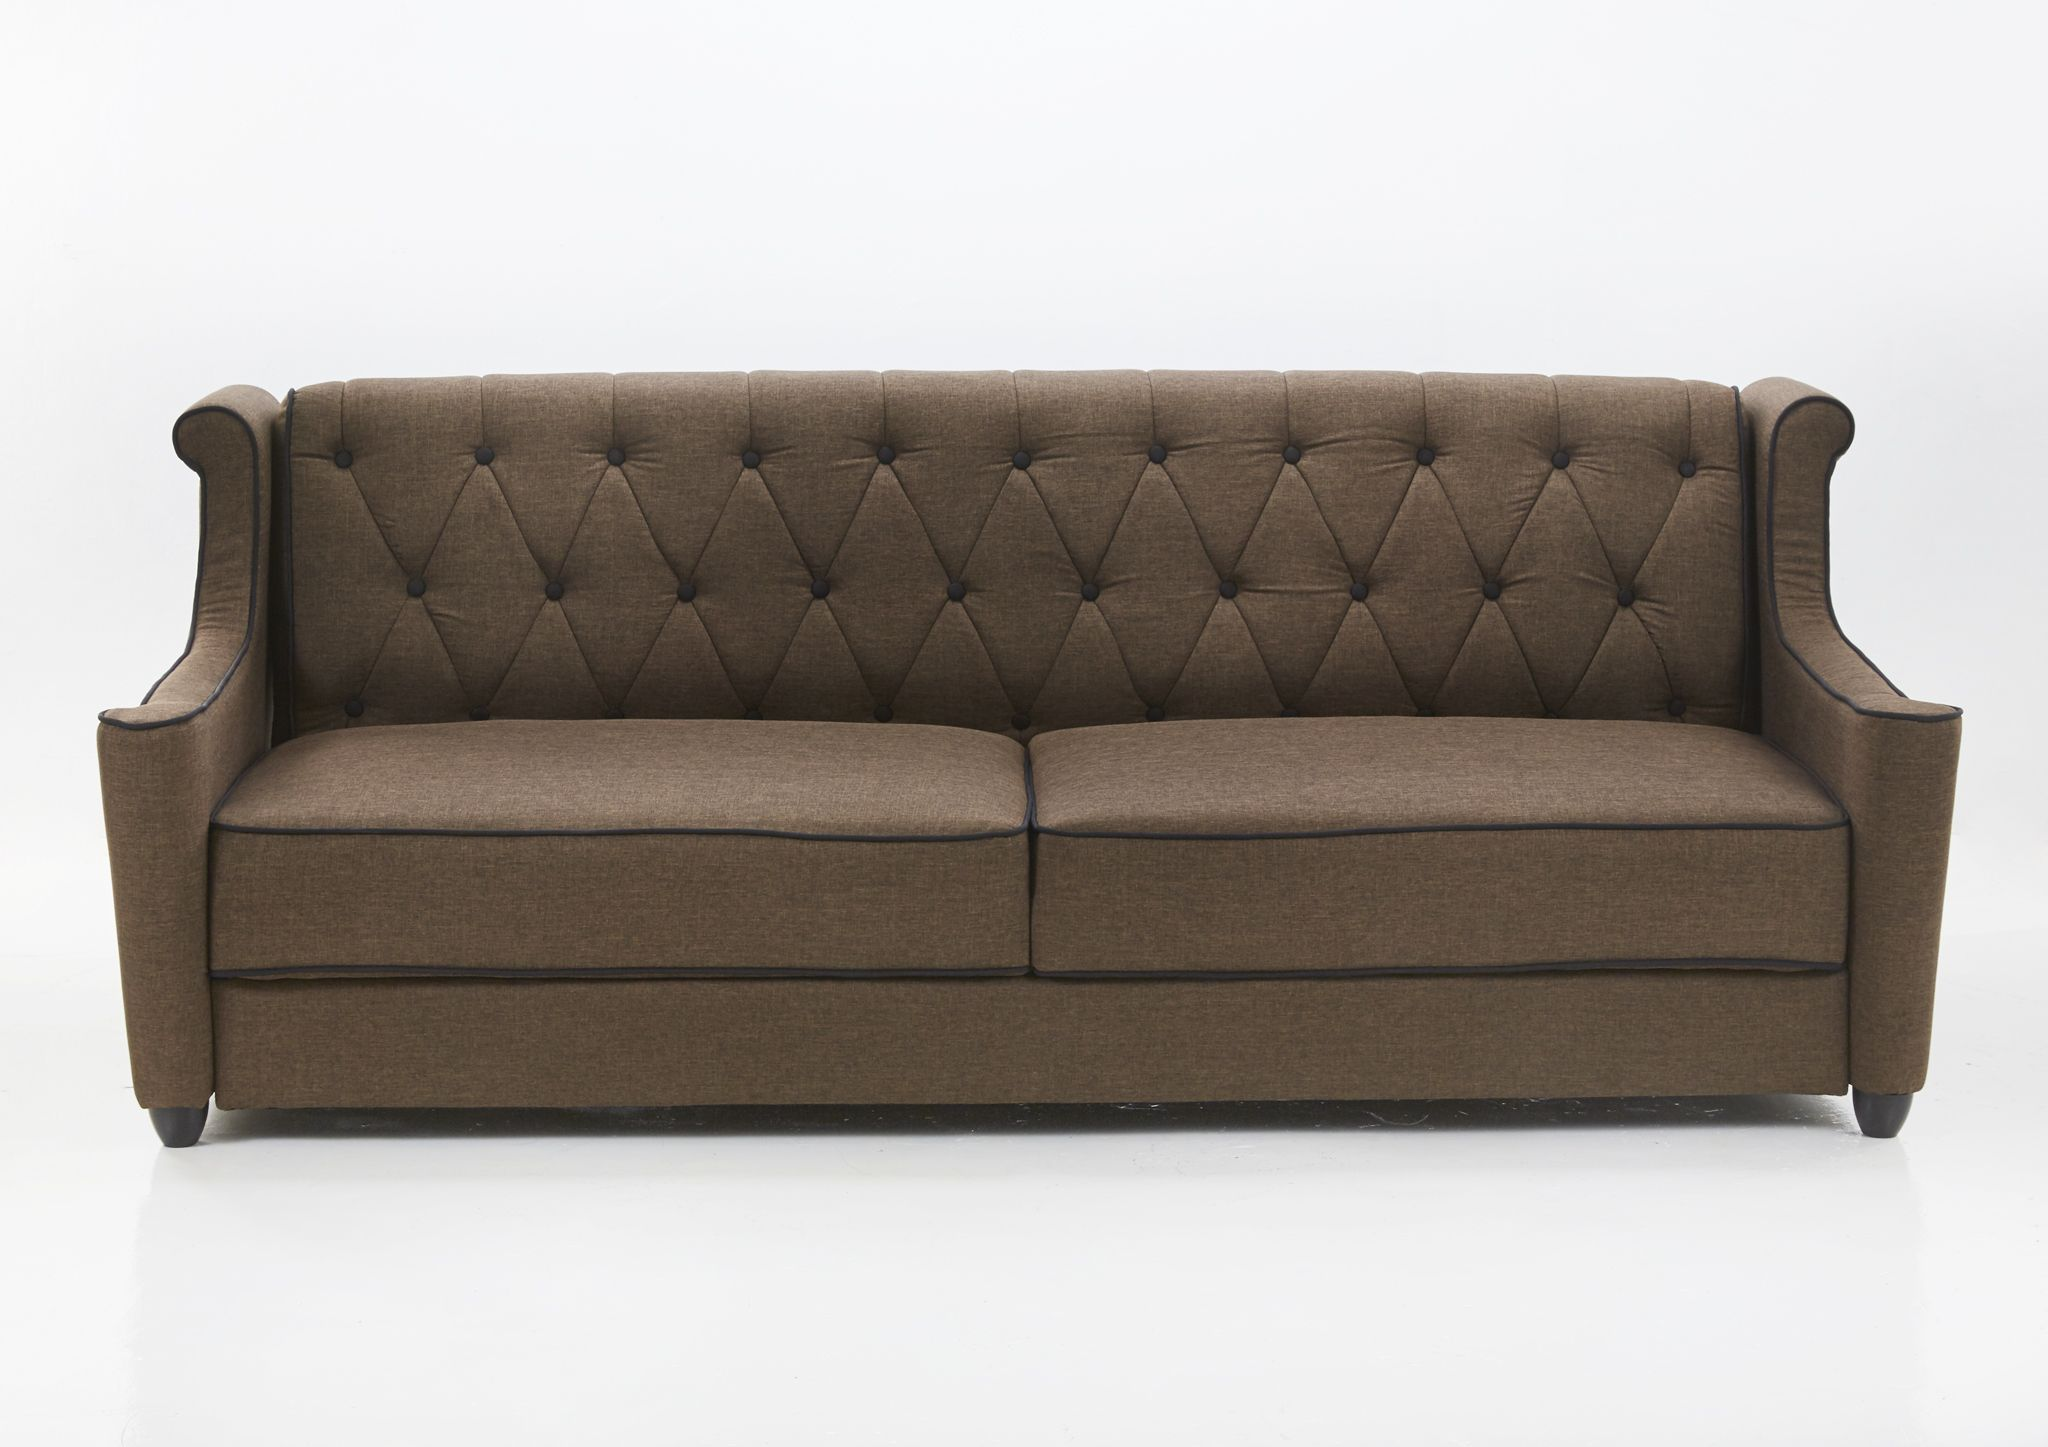 monsaraz sofa bed sofa beds pinterest products rh pinterest com